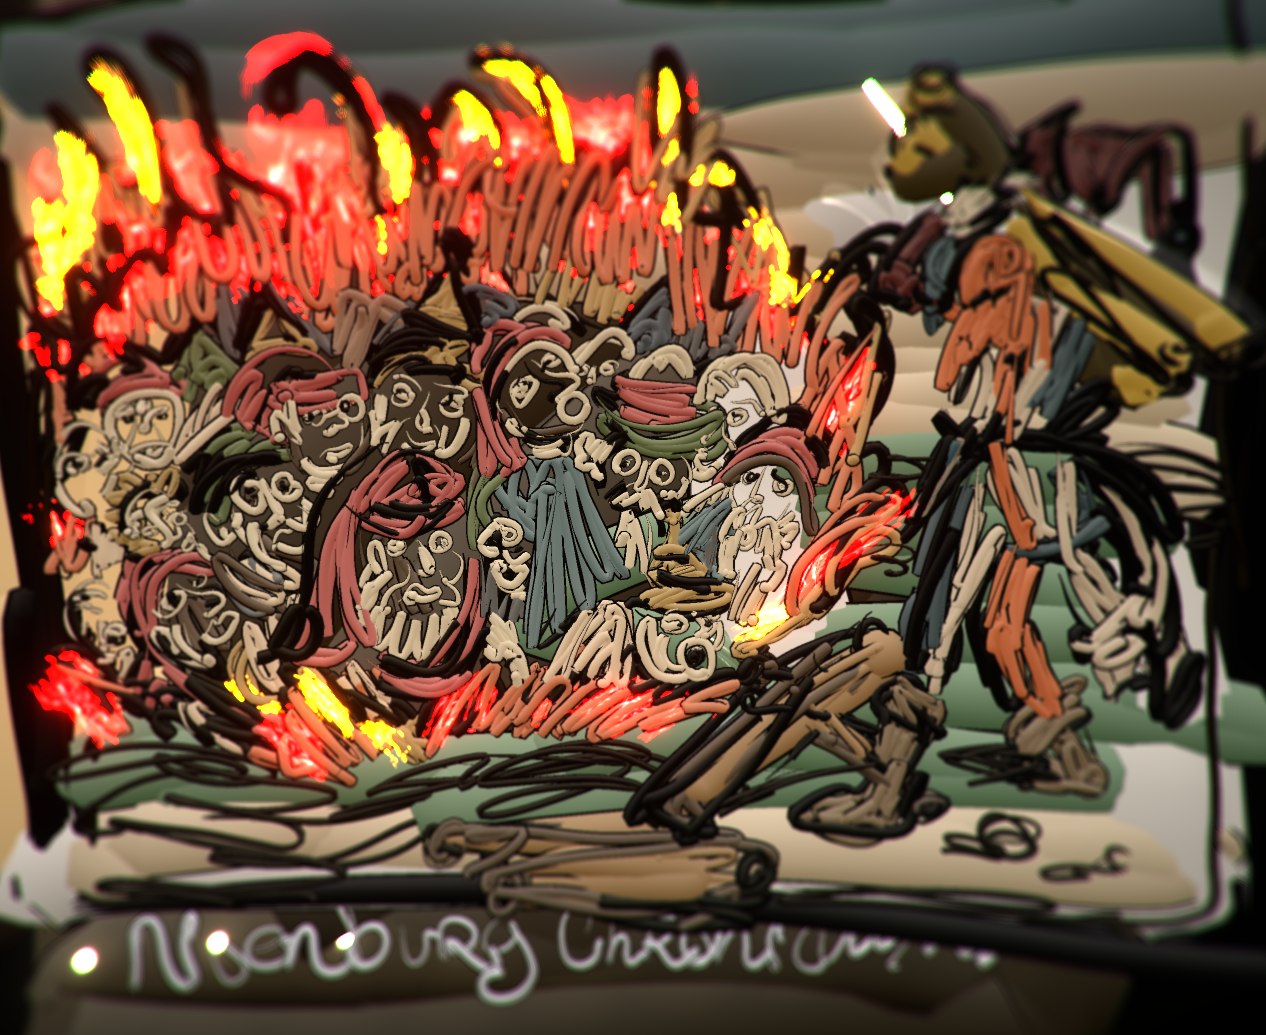 Burning Jews,Nuremberg Chronicles, 1493